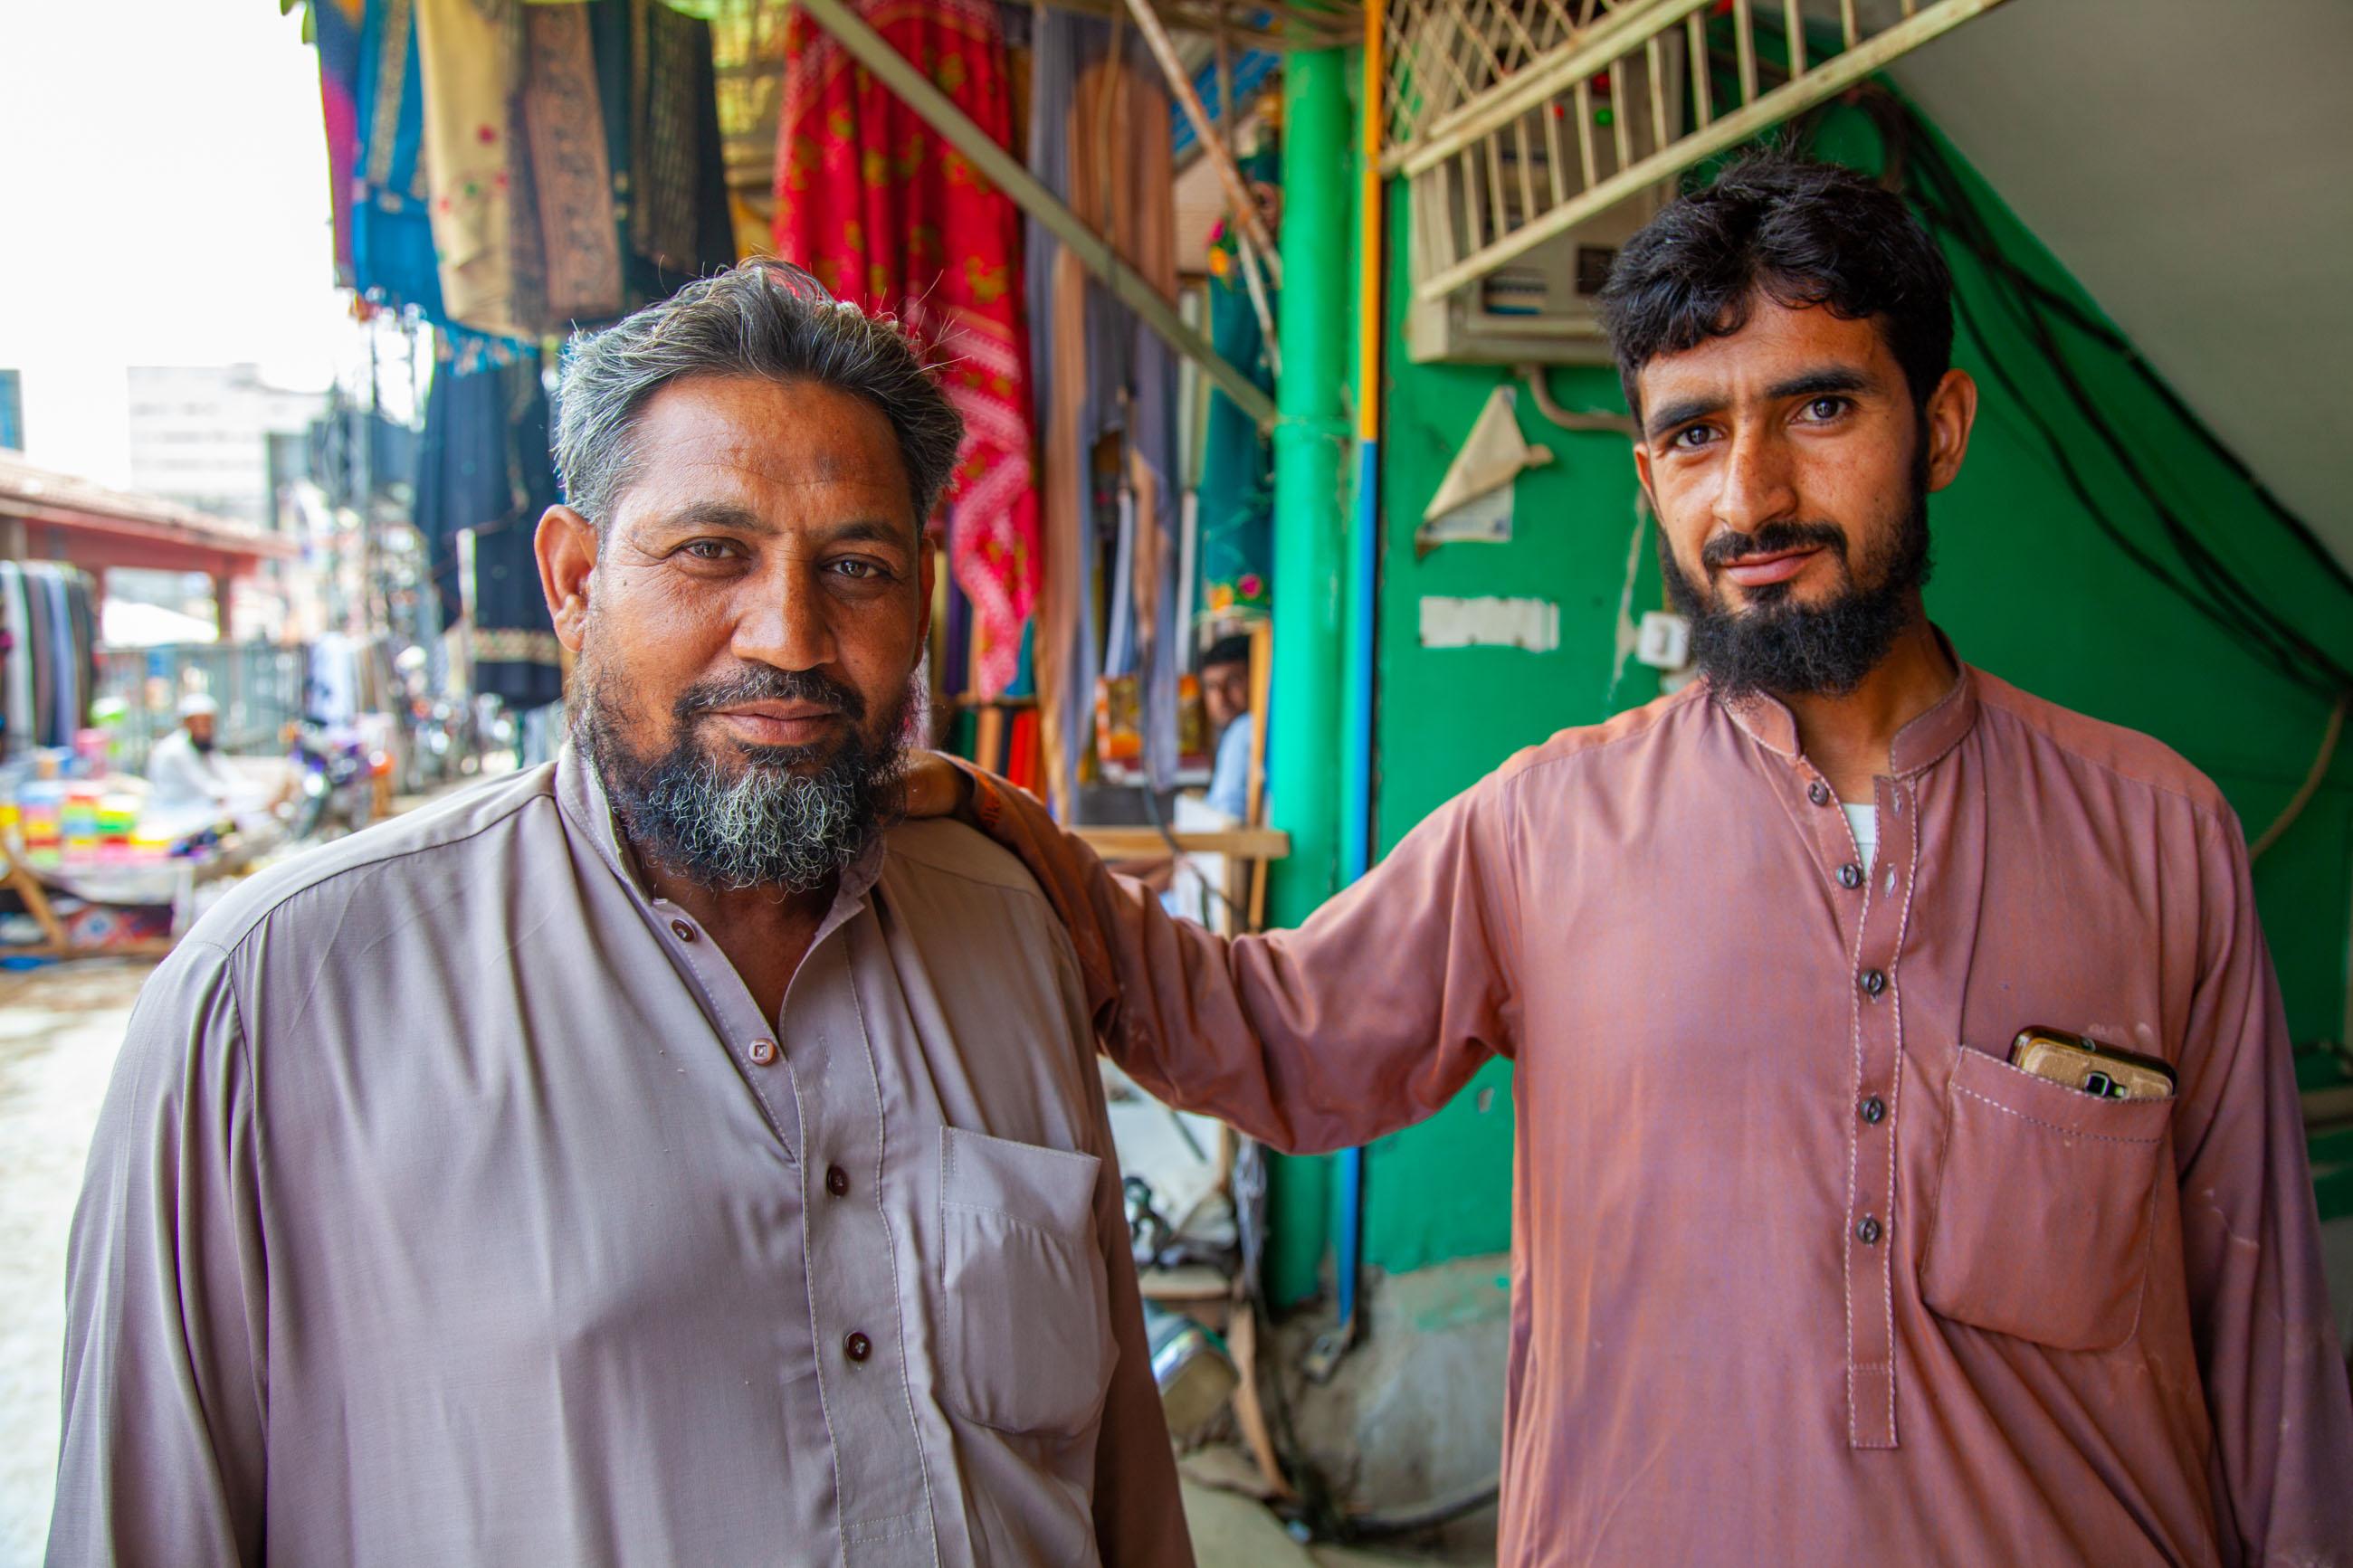 https://bubo.sk/uploads/galleries/4920/samuelklc_pakistan_peshawar_lahore_img_0043.jpg